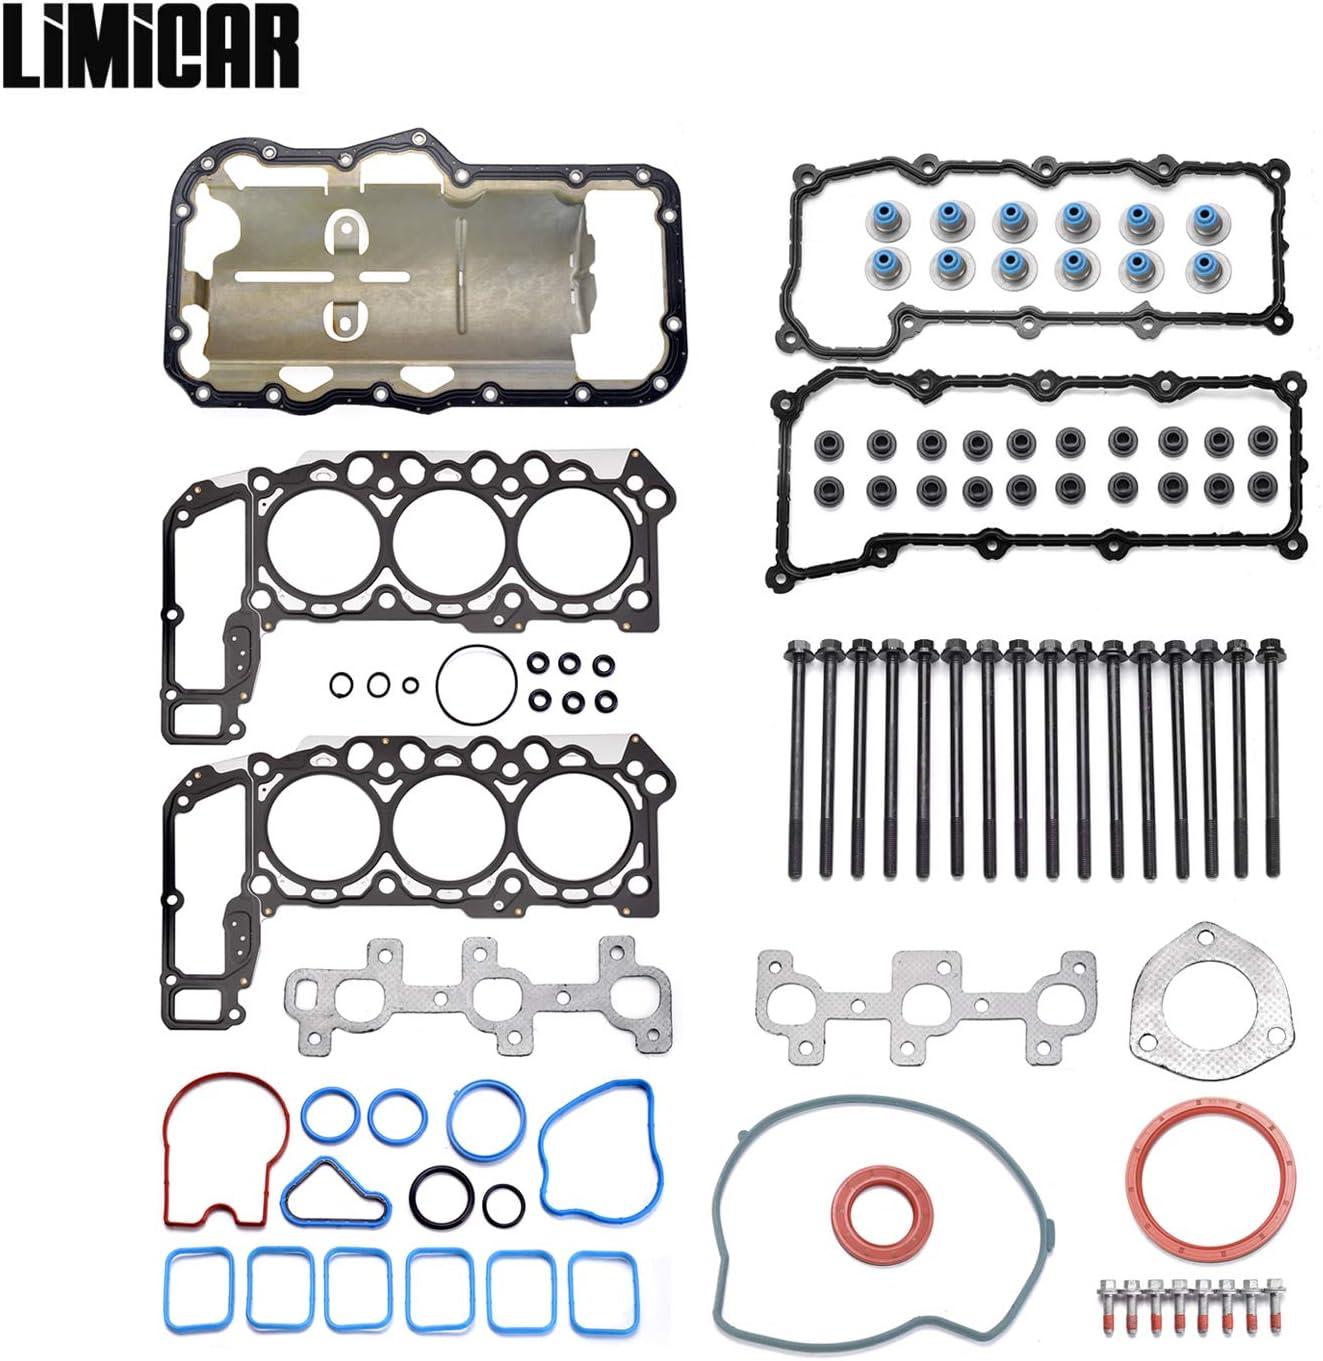 LIMICAR MLS Cylinder Full Head Gasket Set with Head Bolts Compatible with 2002-2005 Jeep Liberty Dodge Ram 1500 2004-2005 Dodge Dakota Durango 2005 Jeep Grand Cherokee 3.7L Vin K